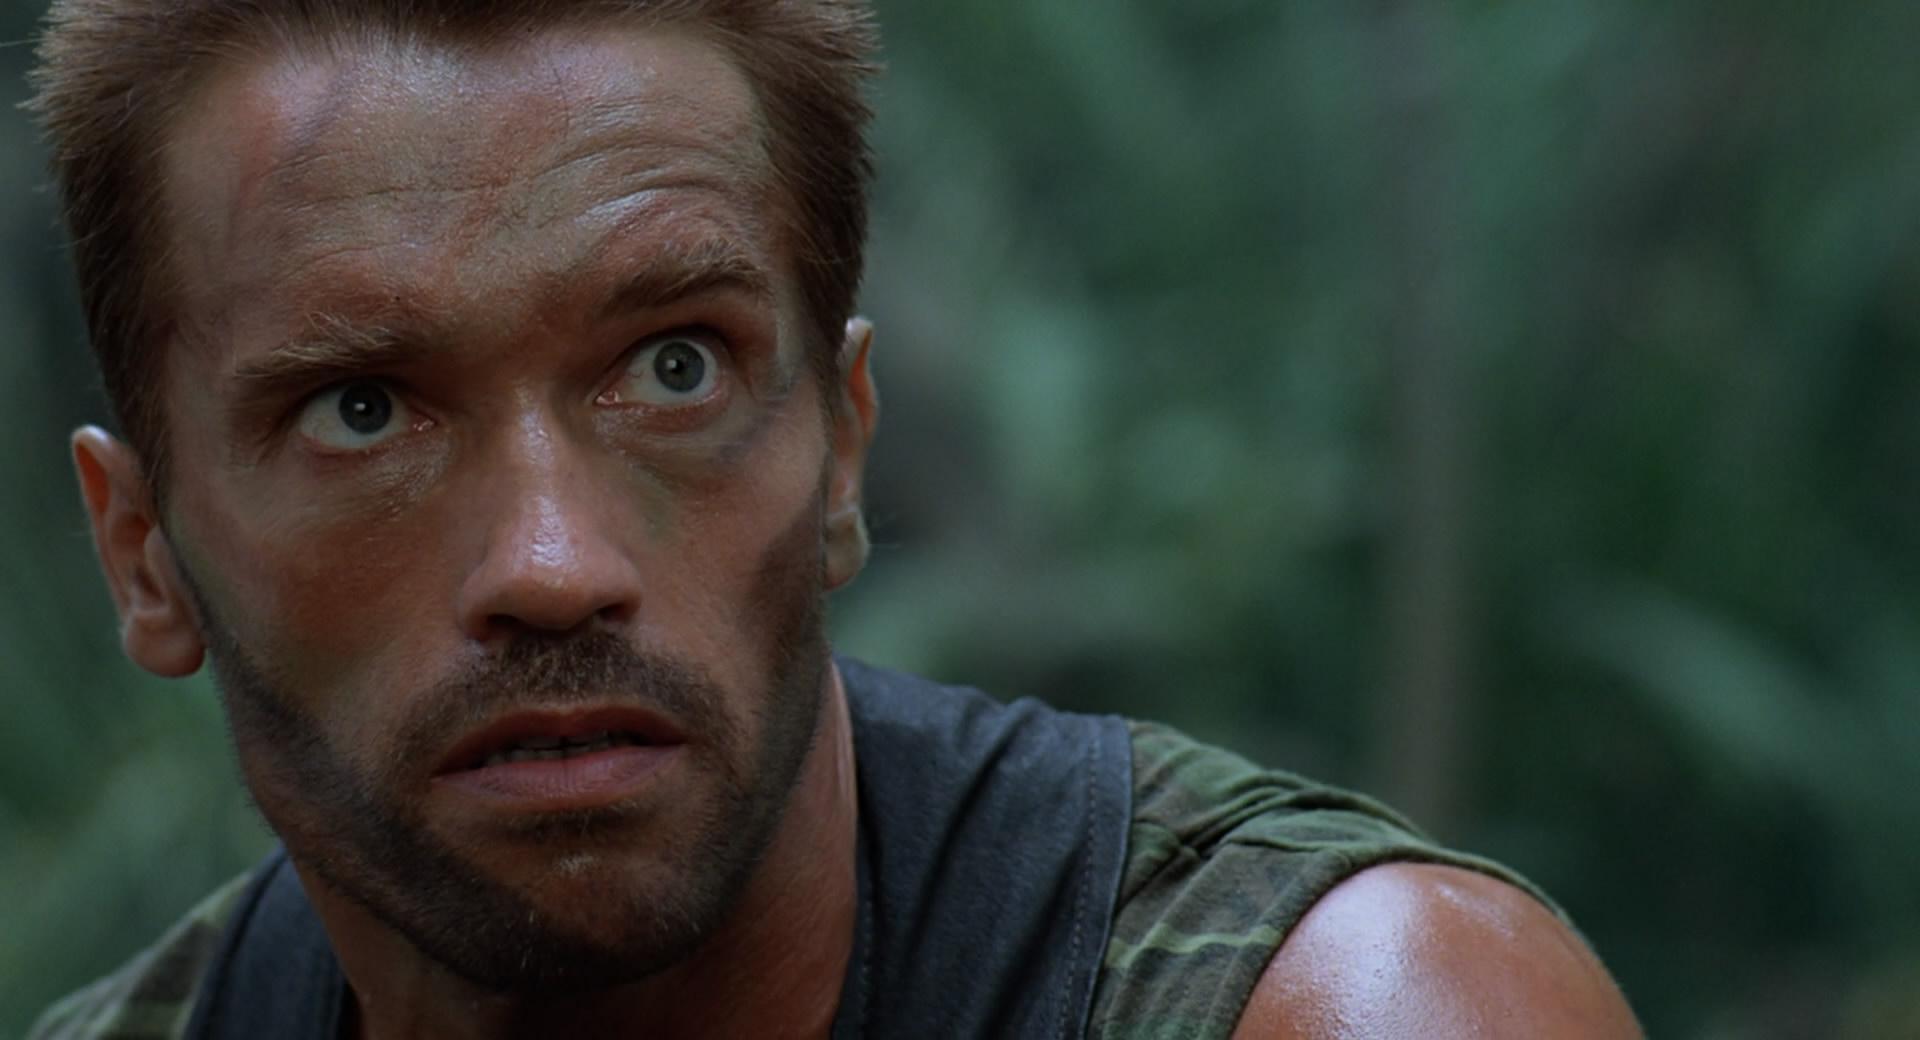 Arnold Predator Face Paint